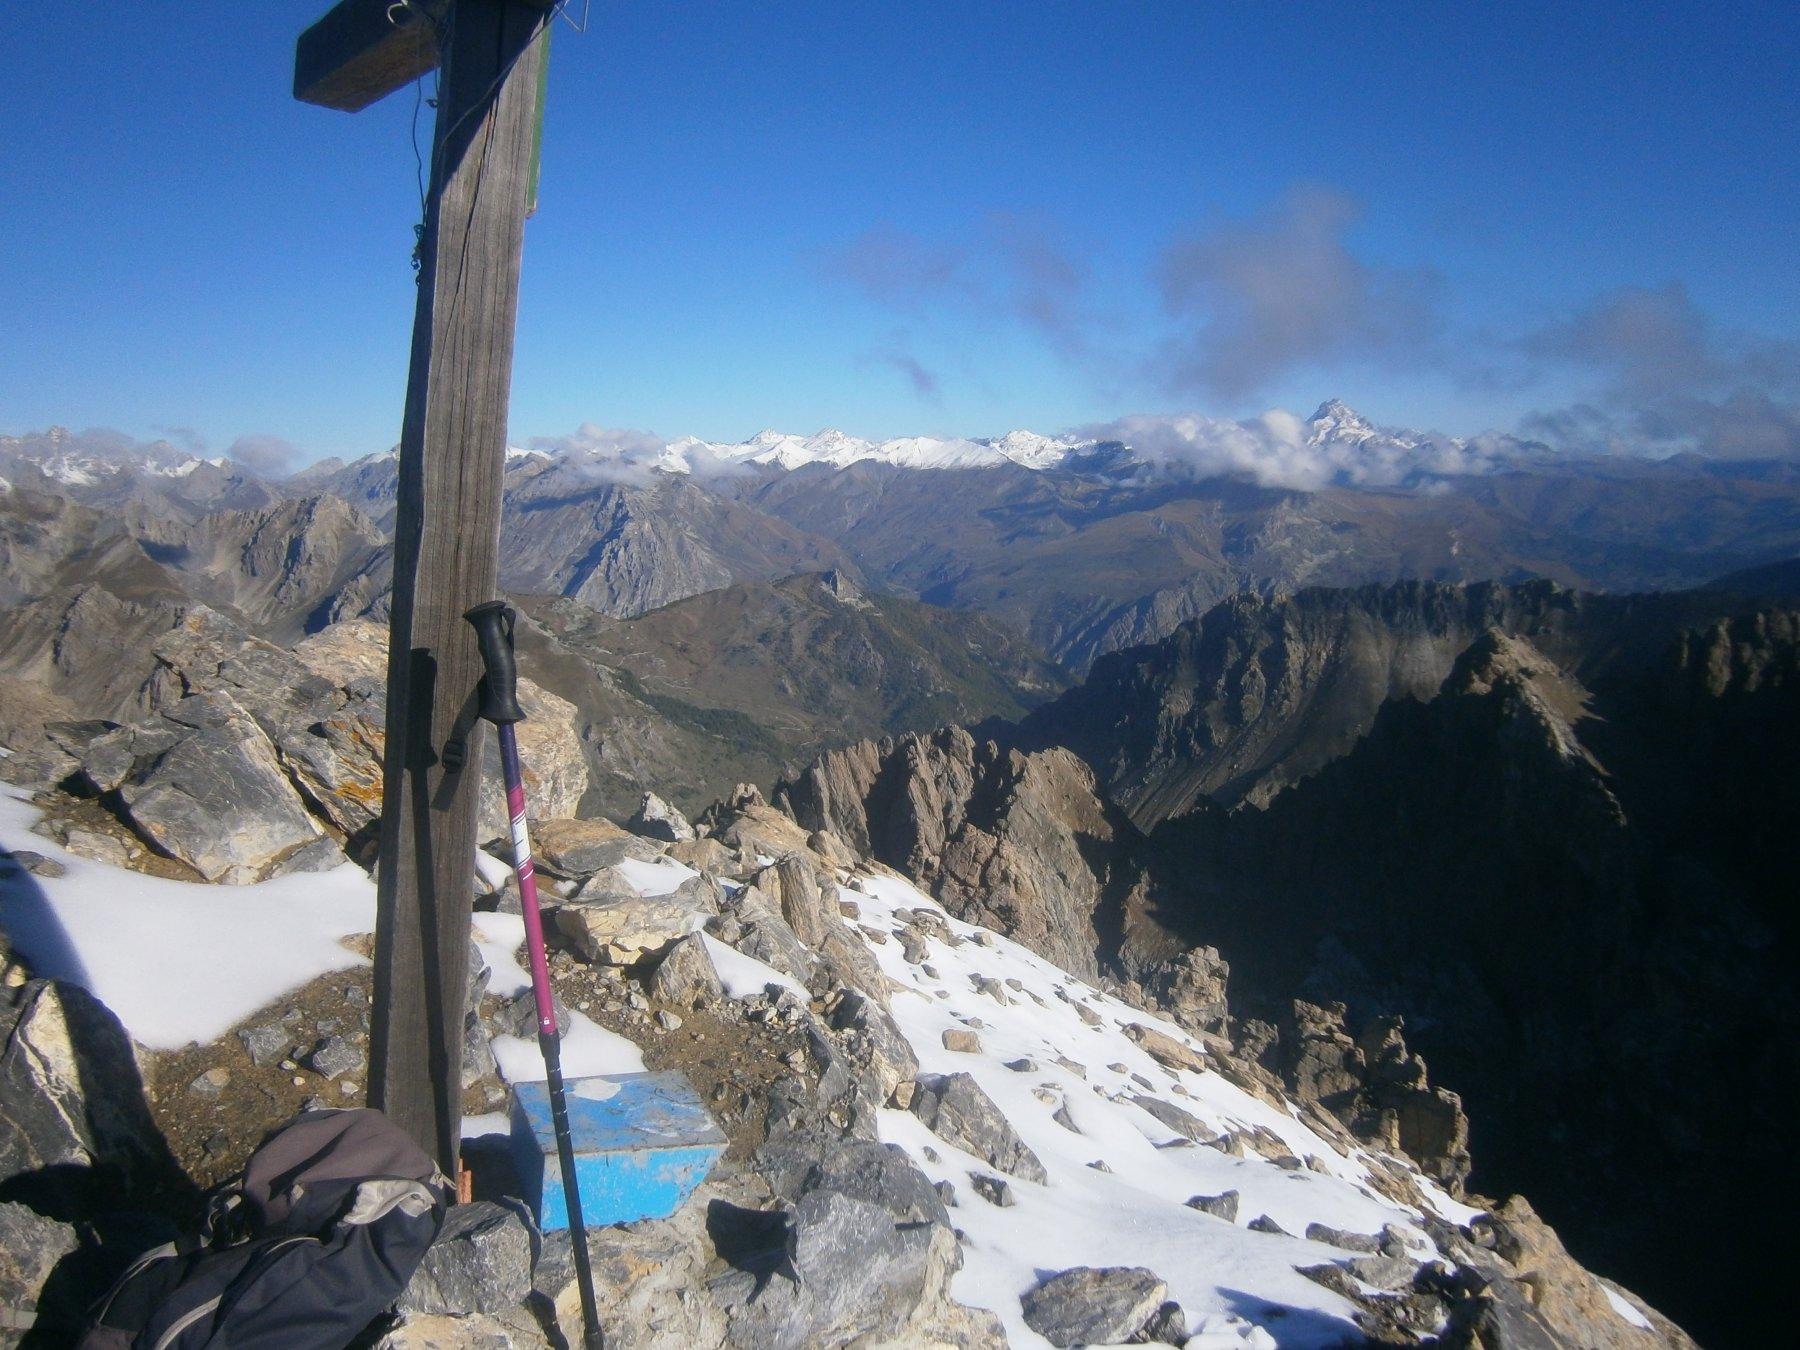 Una spruzzata di neve in vetta all'Oserot